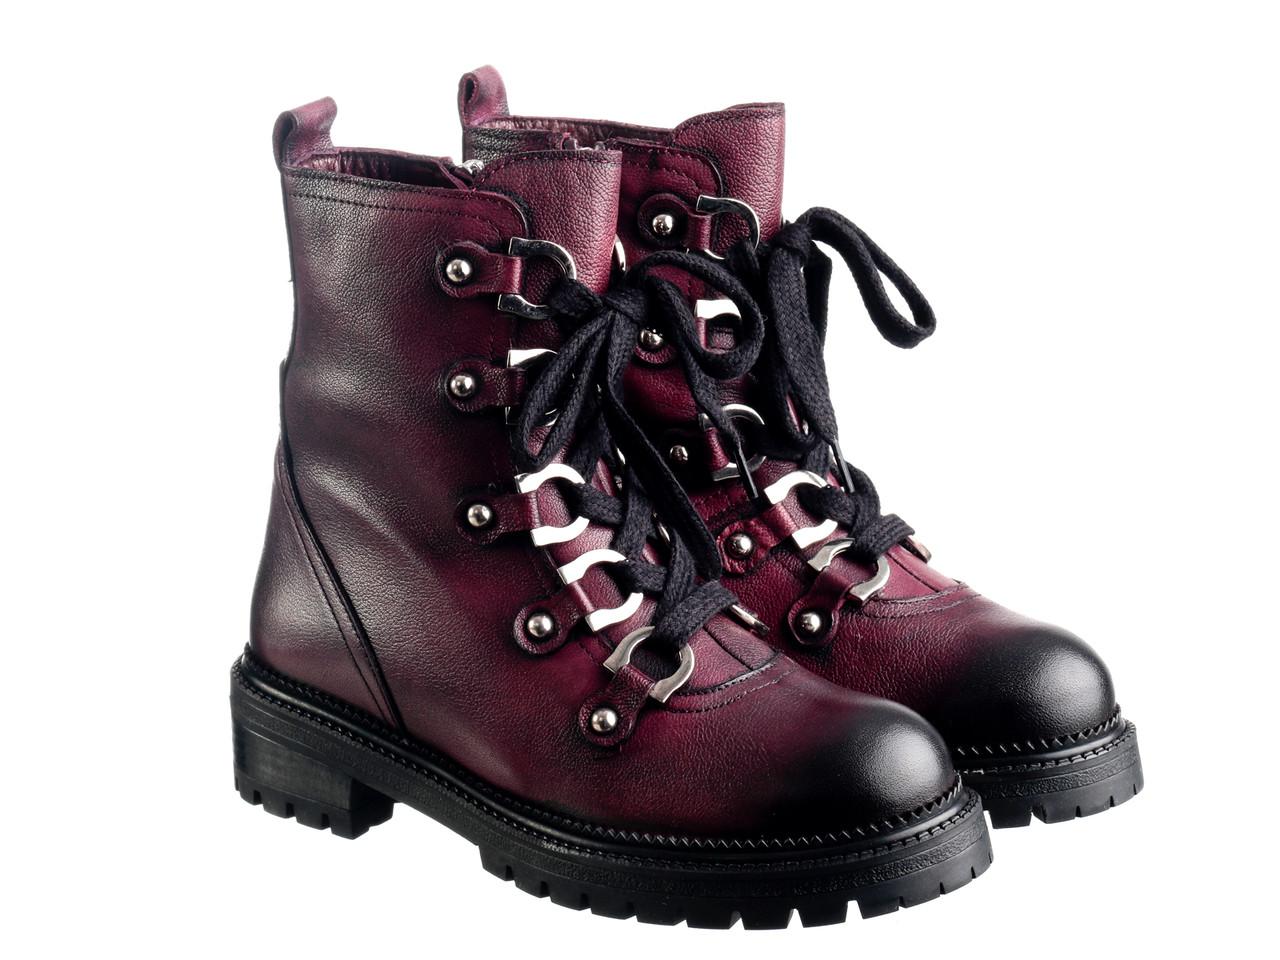 Ботинки Etor 7017-7495-604 бордо, фото 1